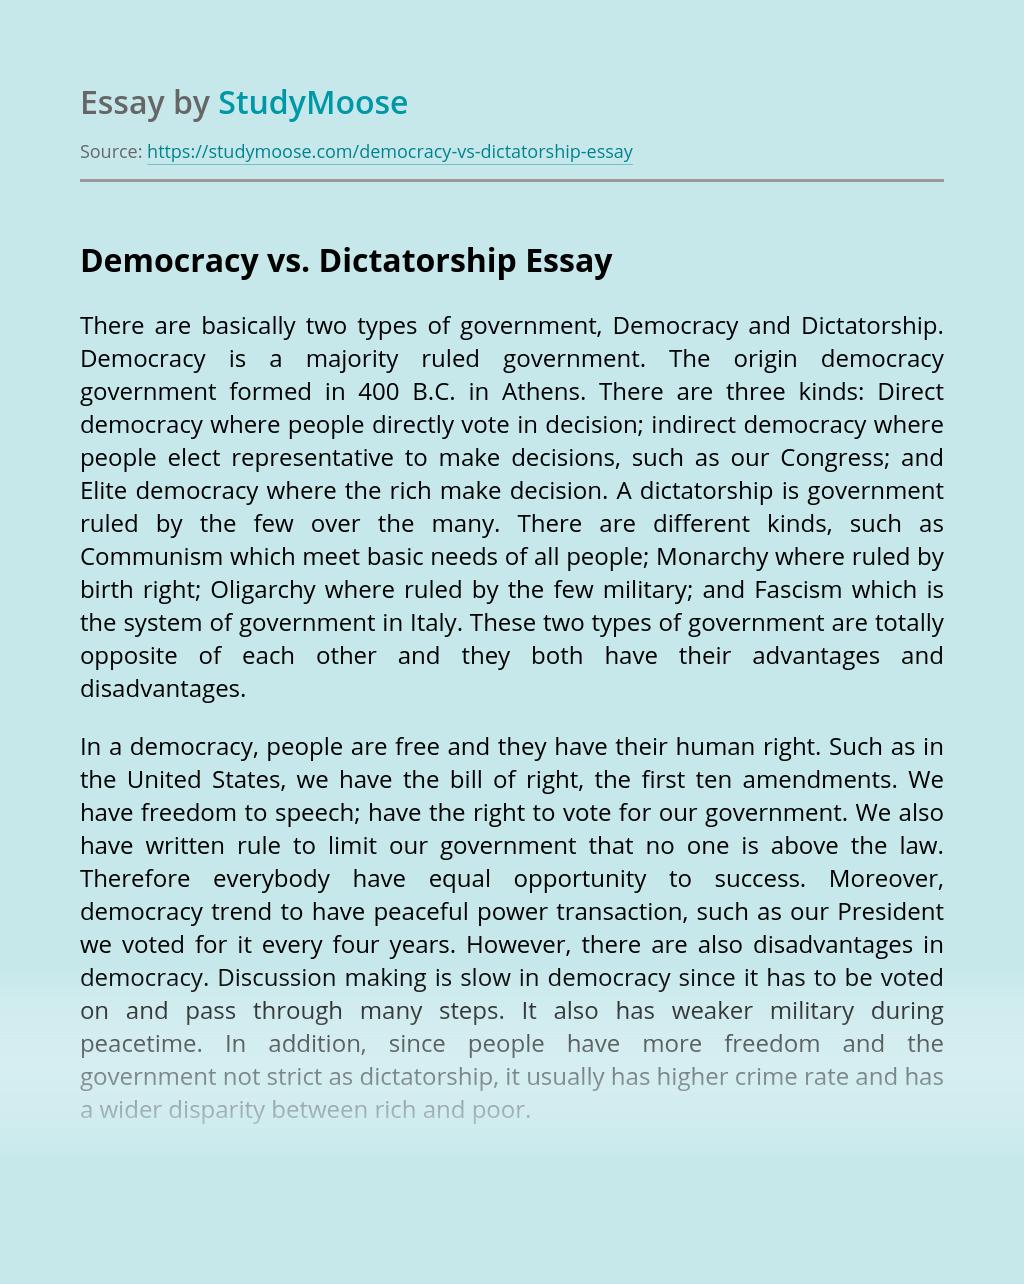 Democracy vs. Dictatorship